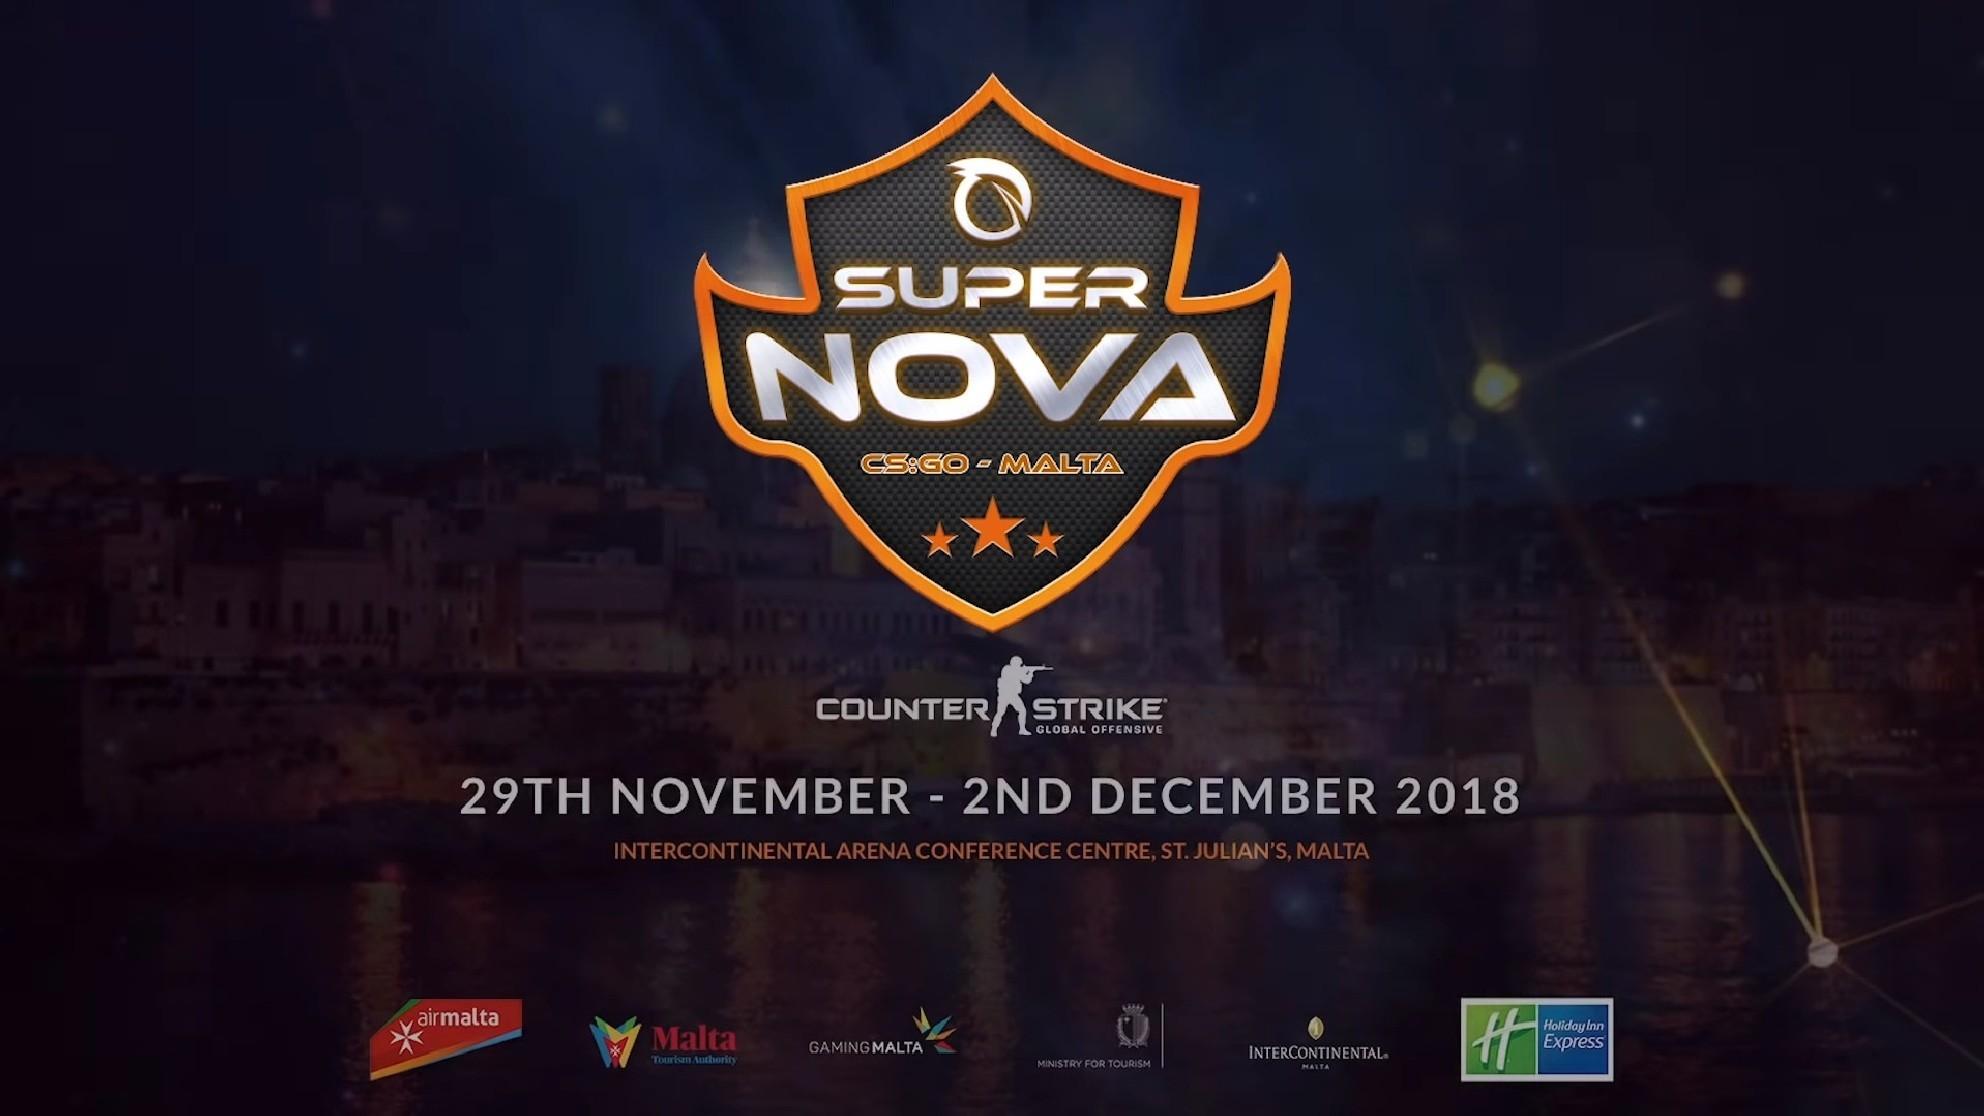 SuperNova CS:GO Malta talent list